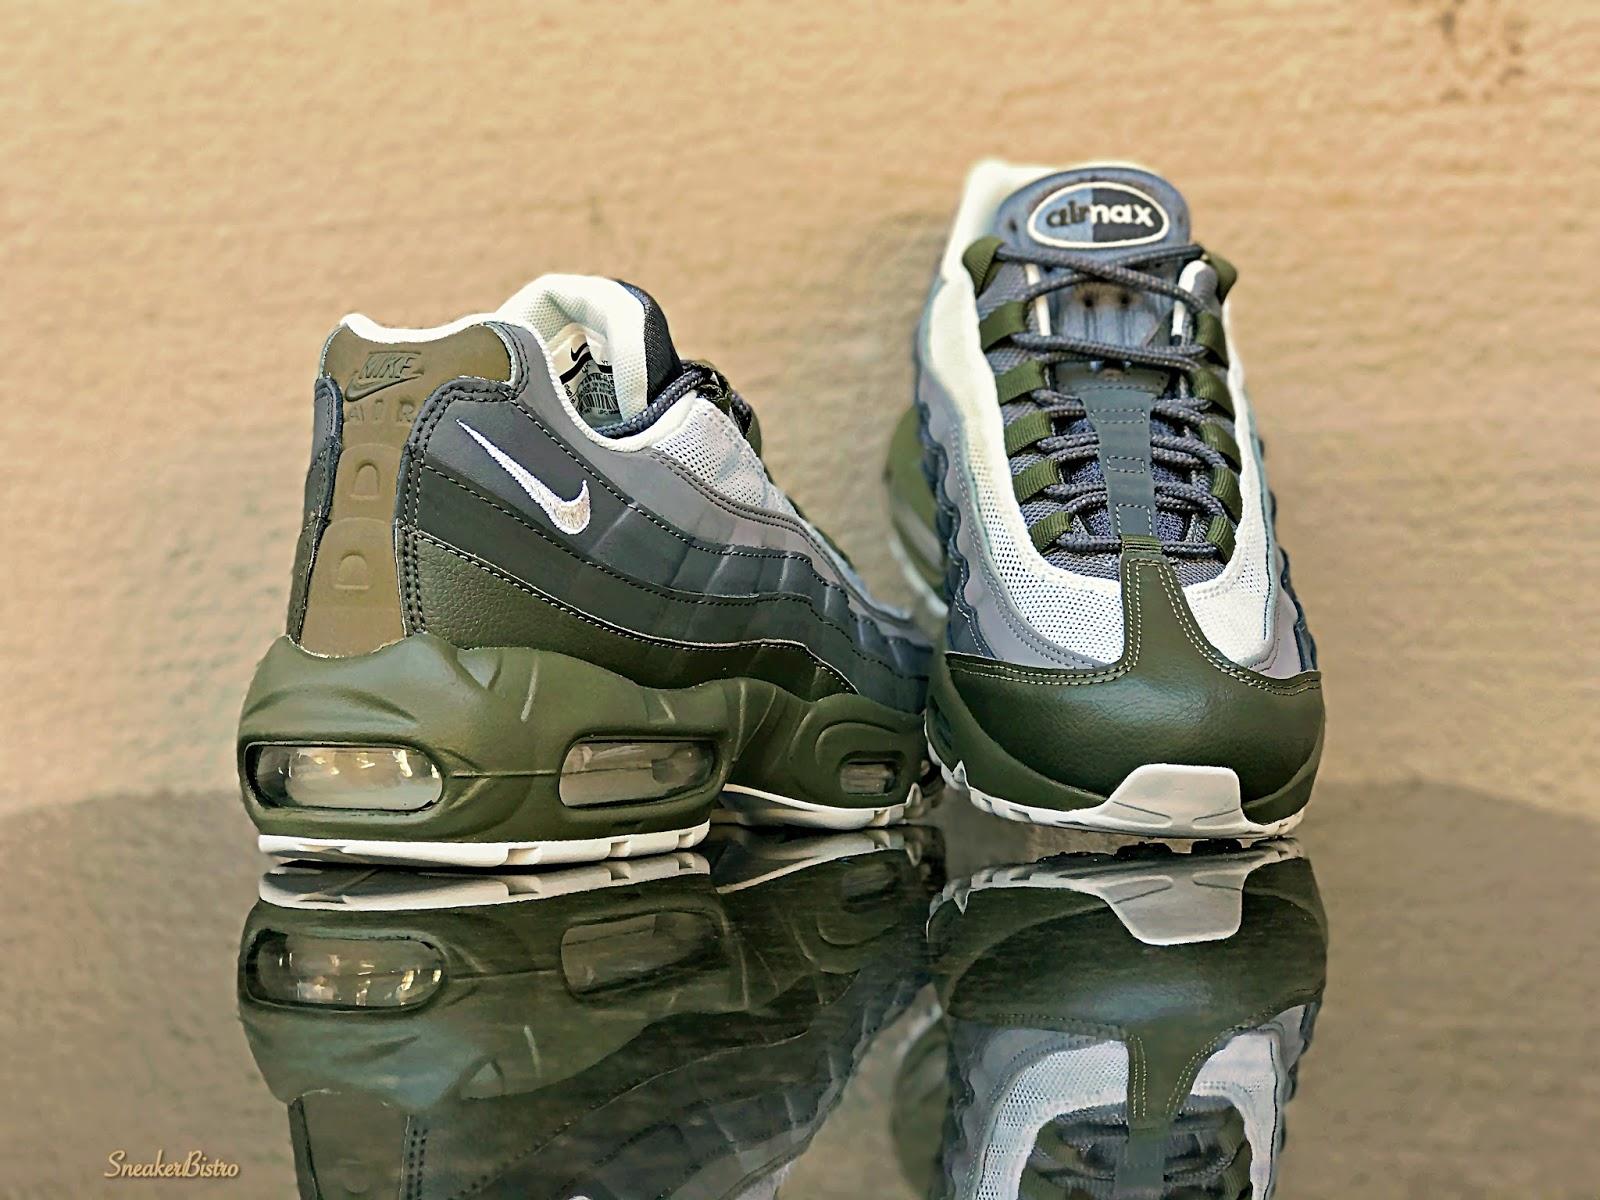 huge discount c6feb a0f6b SNEAKER BISTRO - Streetwear Served w| Class: Nike Air Max 95 ...